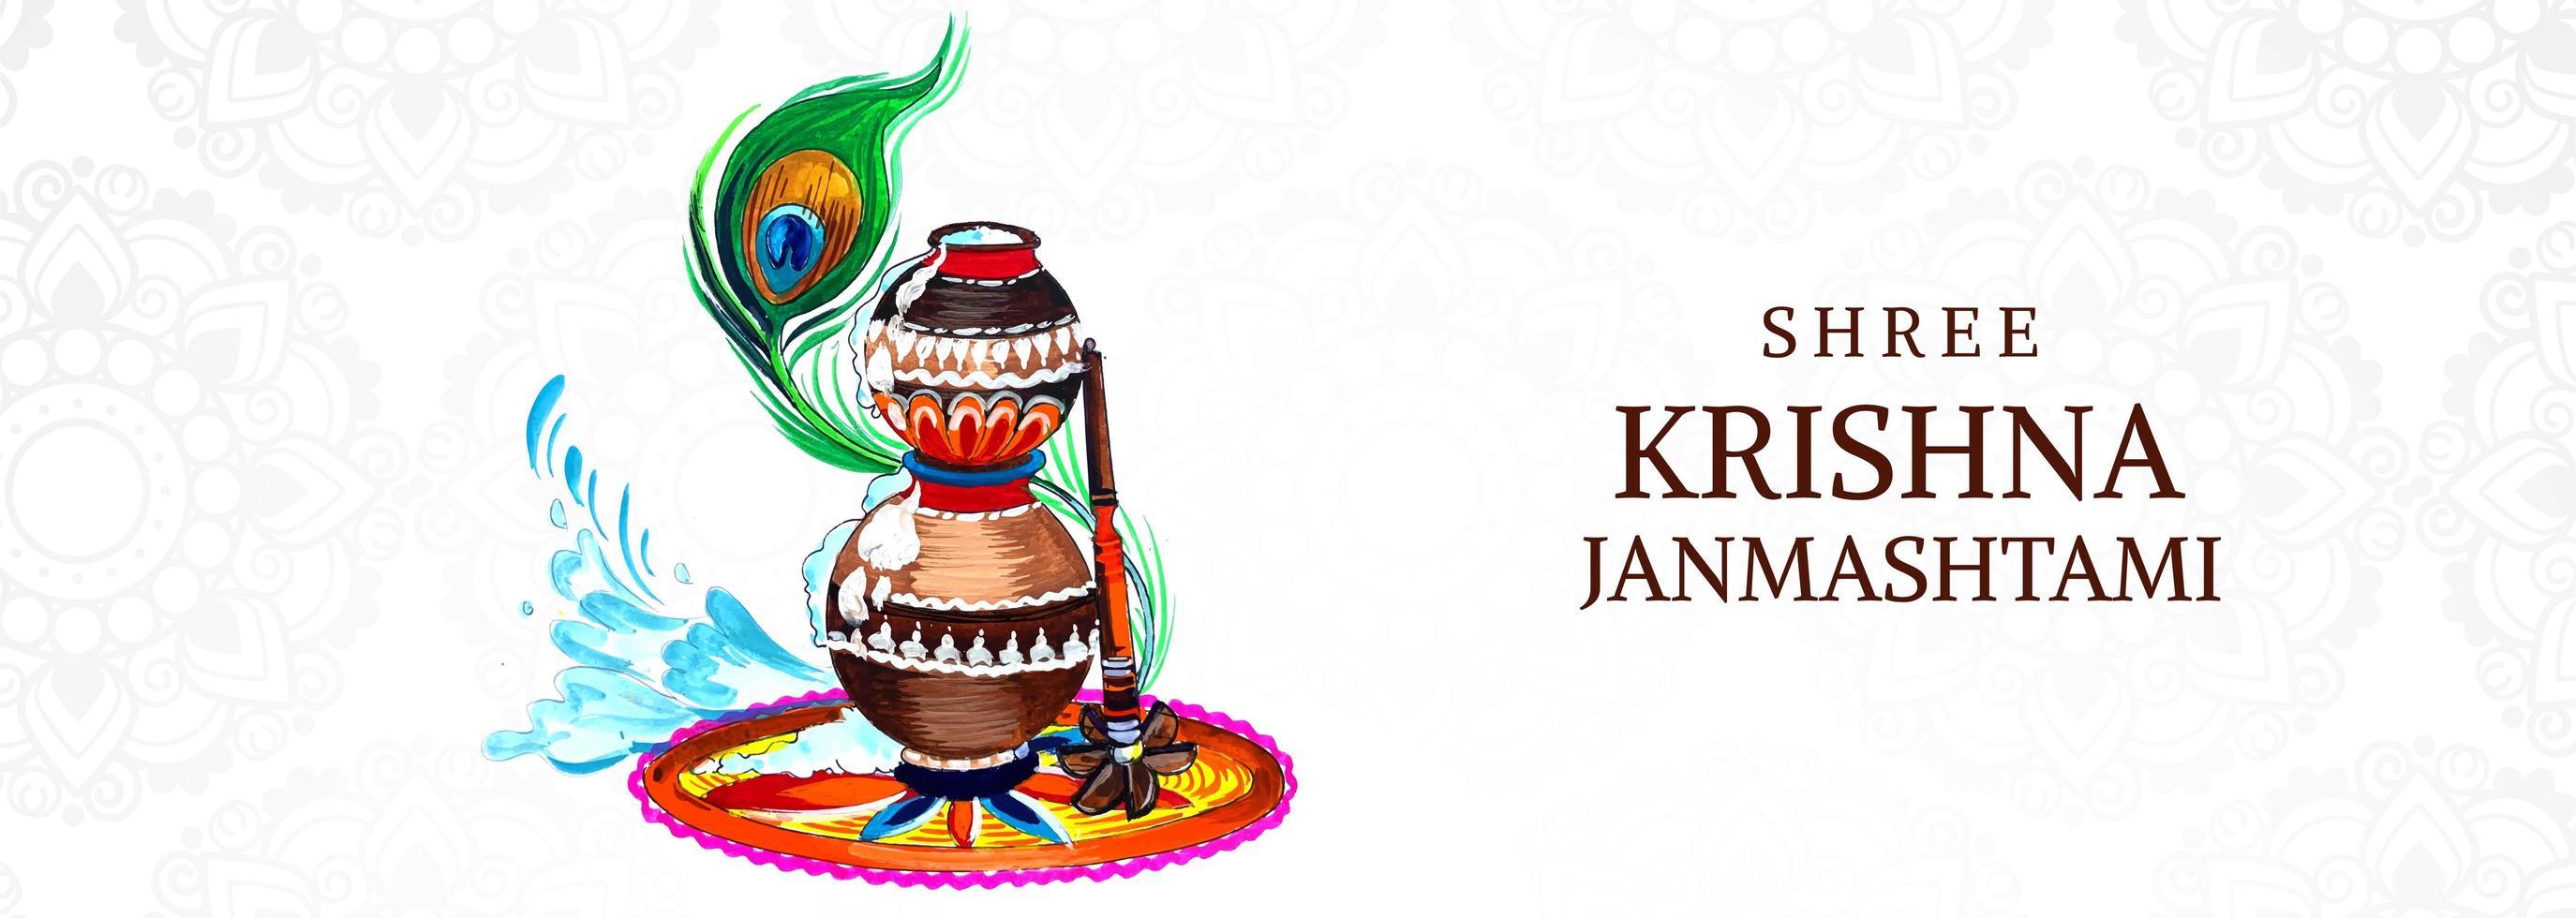 vasi impilati colorati religiosi krishna janmashtami banner vettore